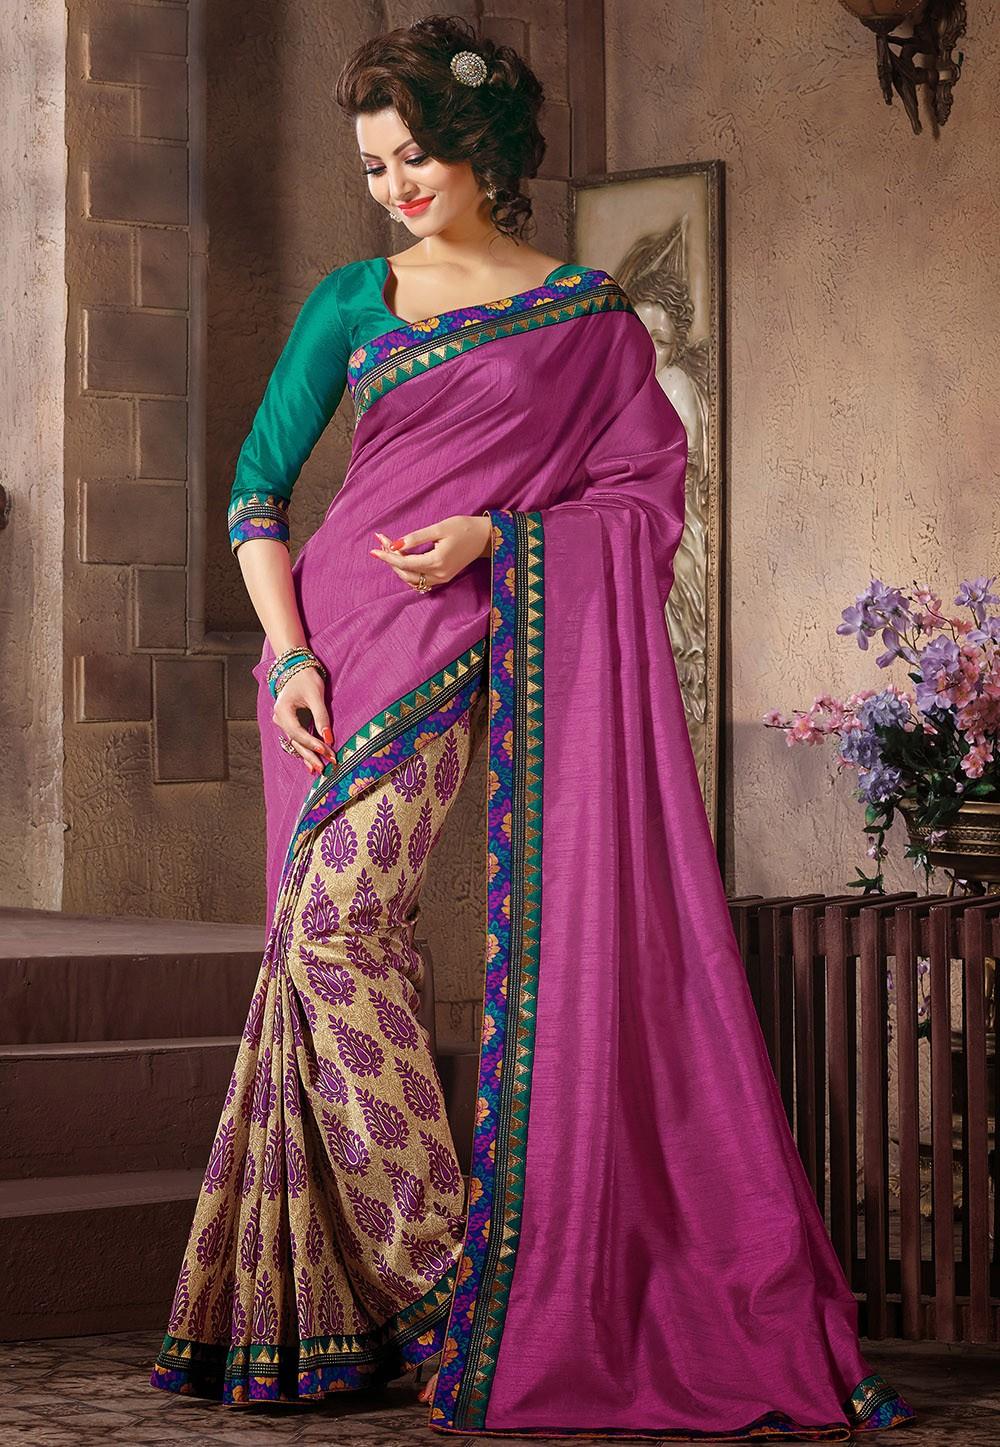 Мода индии фото